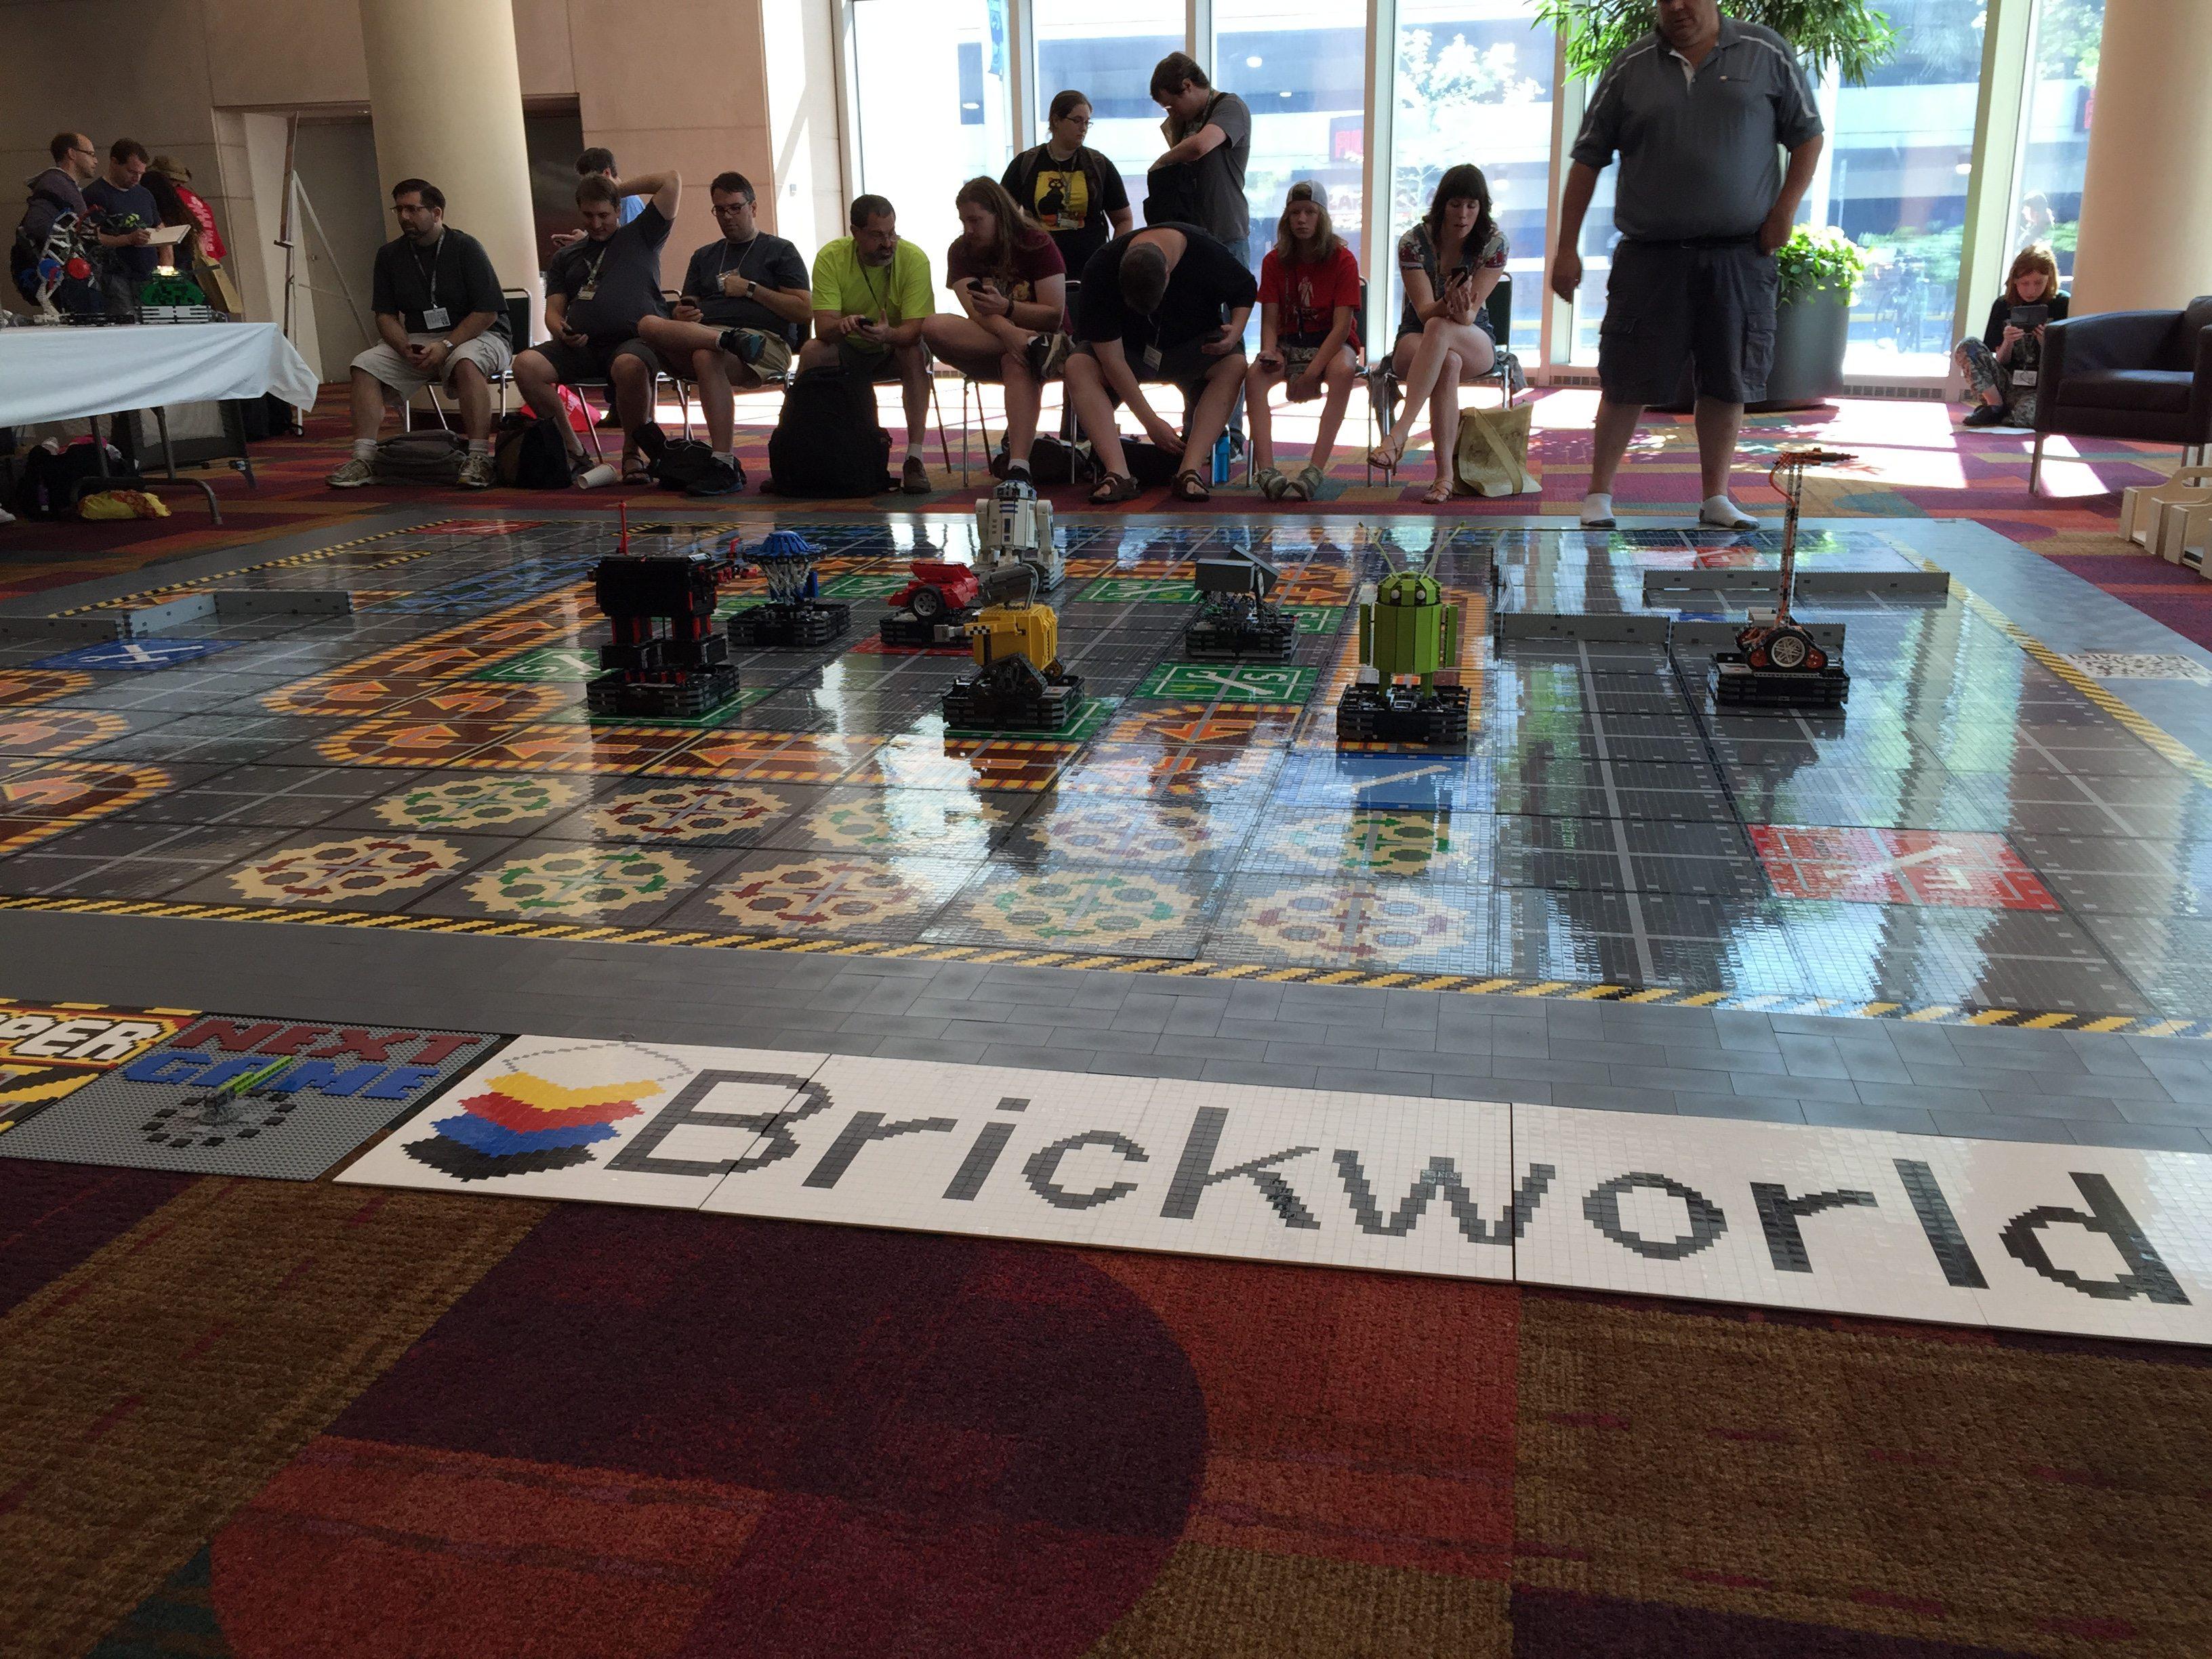 Brickworld's giant edition of Robo Rally